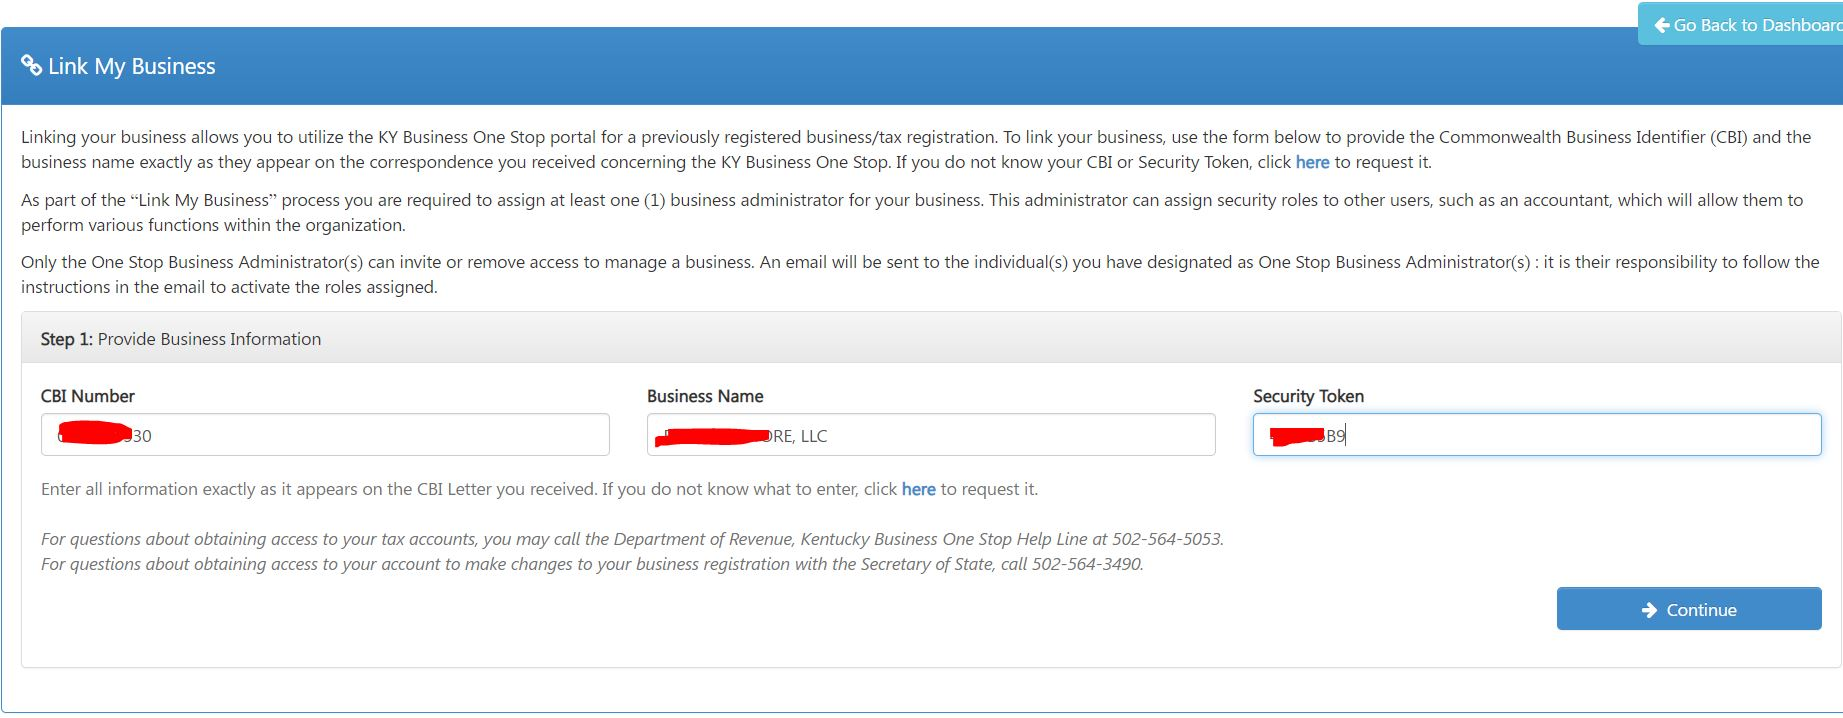 Amerikada sirket kurmak Onestop portal 2 Kentucky LLC'yi One Stop Portal'a Kaydedin